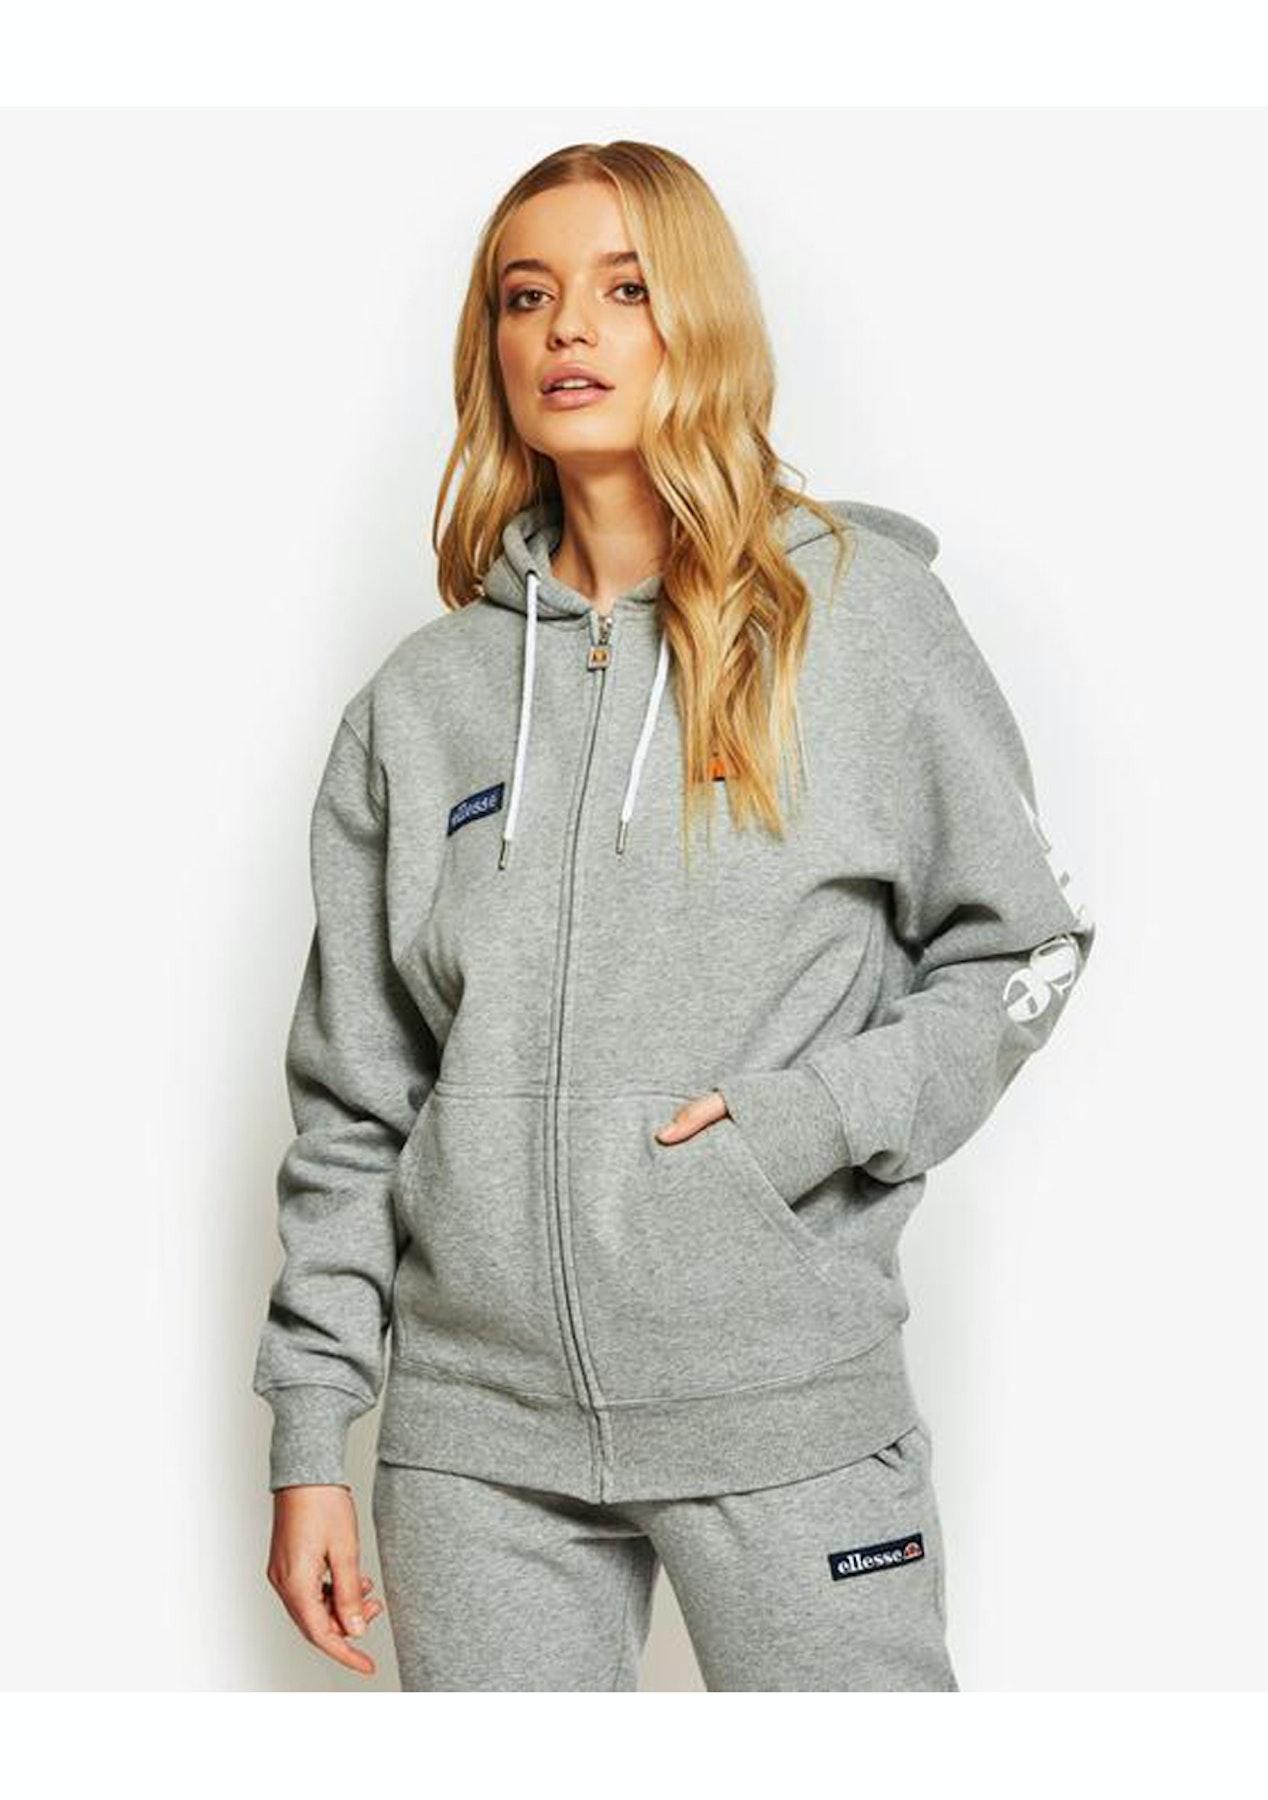 181e63b1c7 Ellesse - Serinatas Zip Hoody - Ath Grey